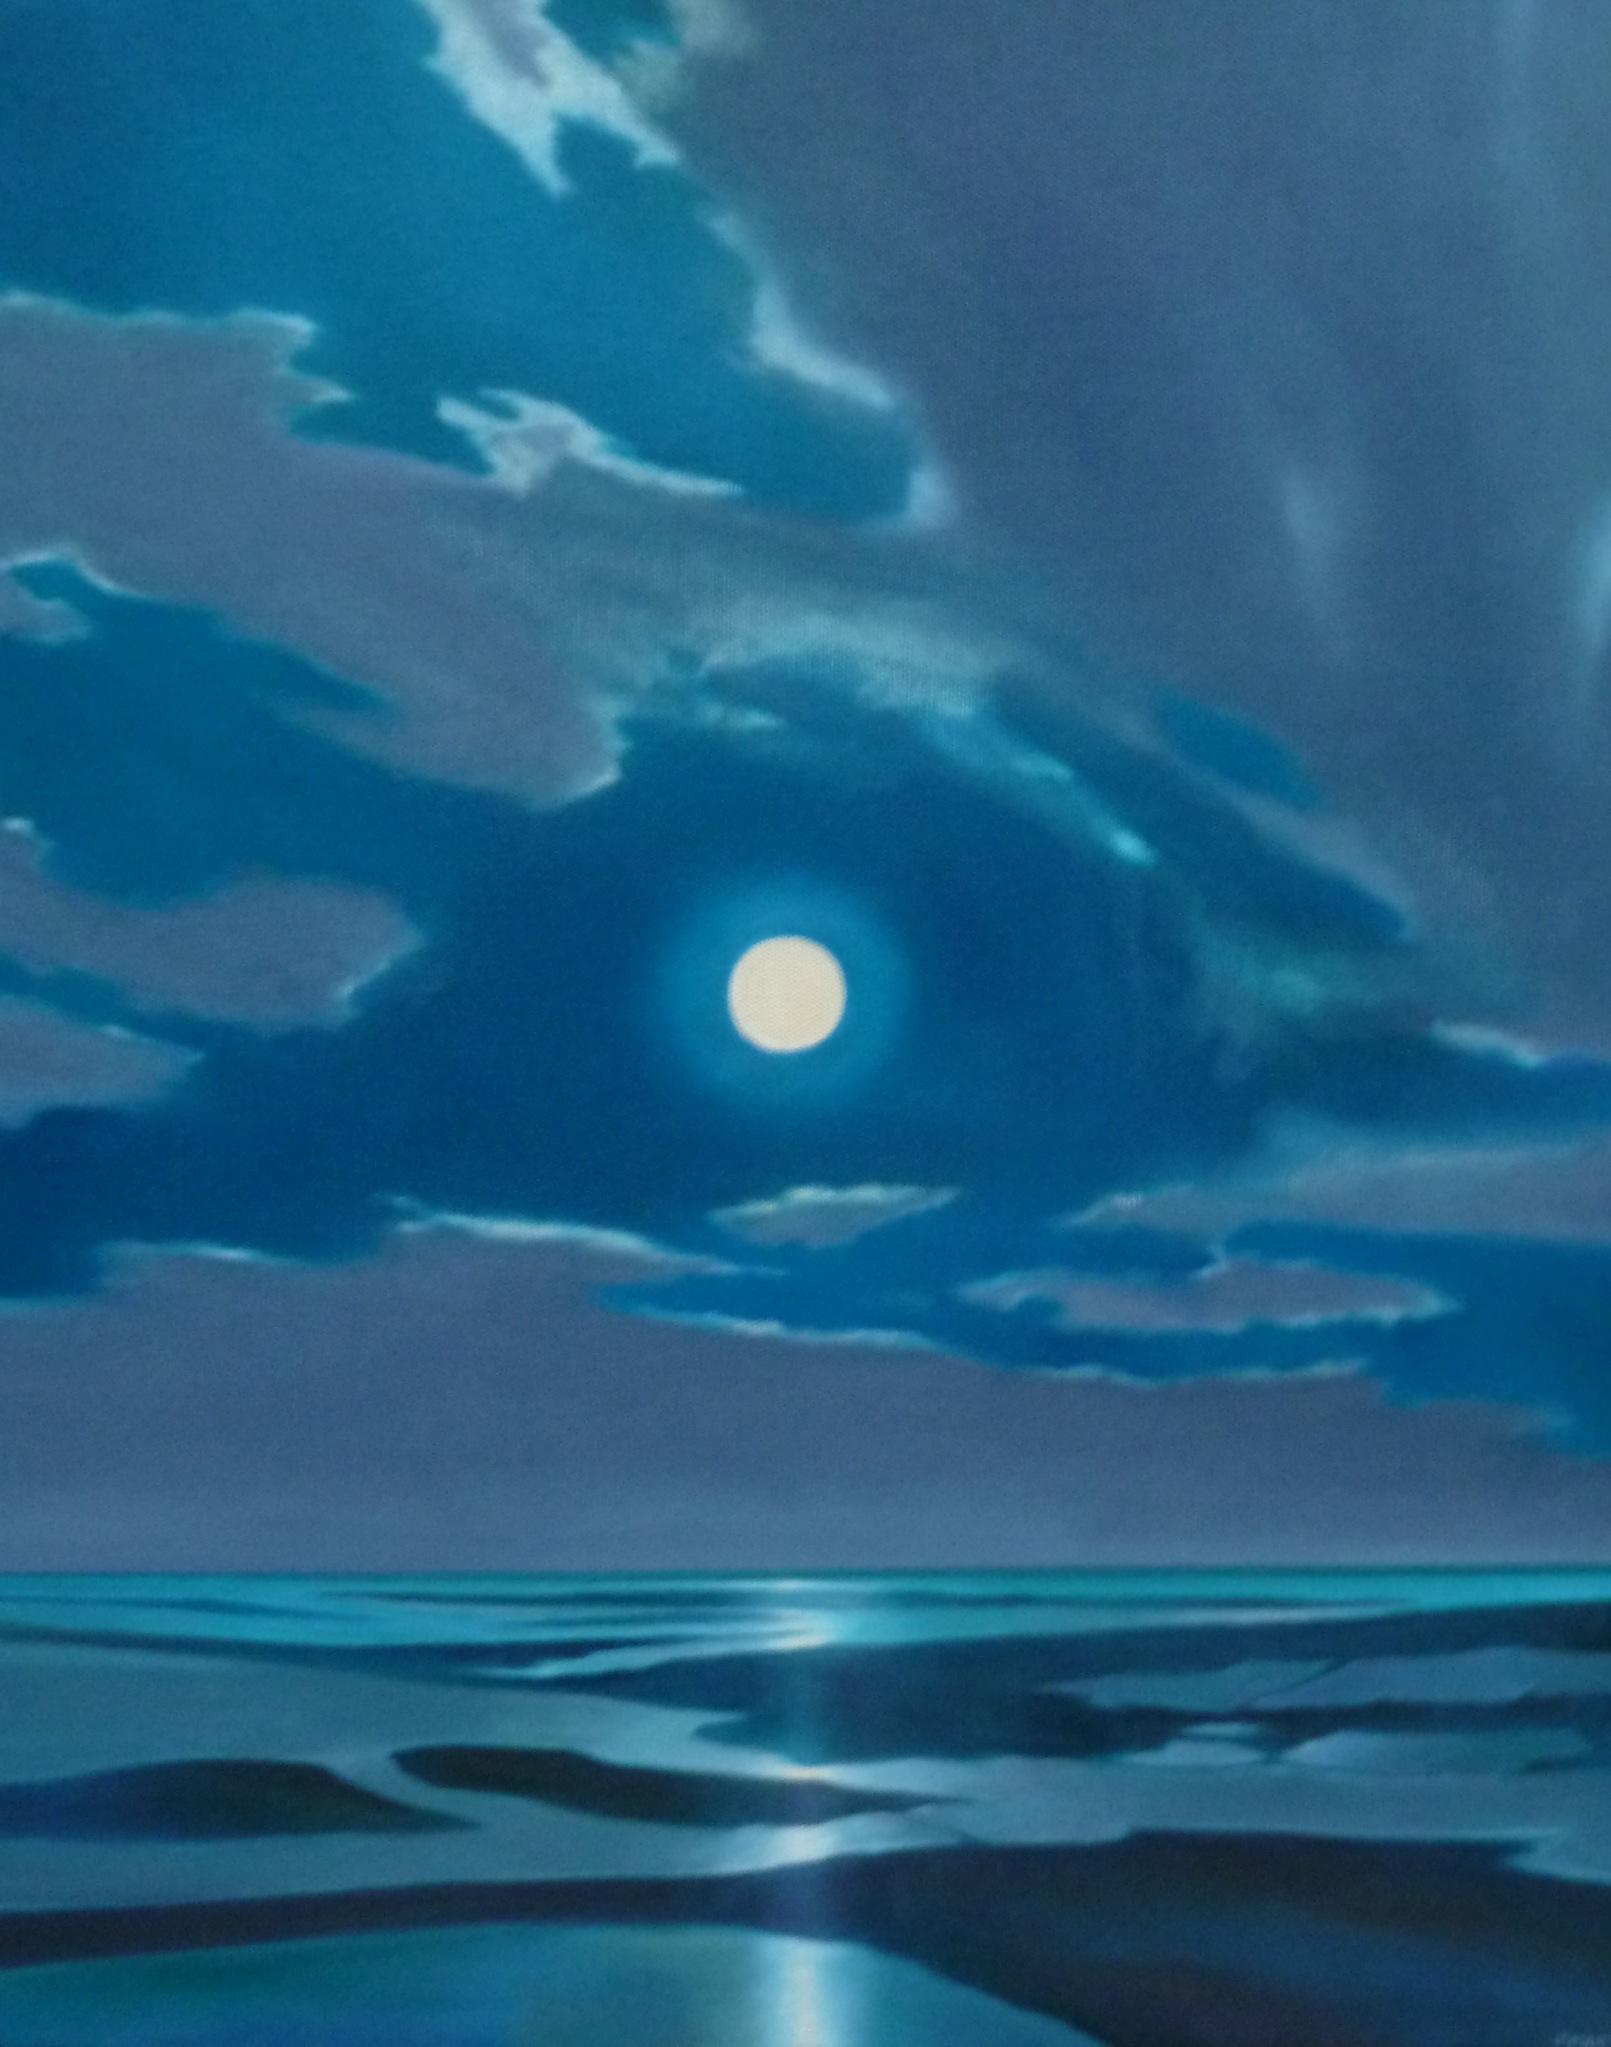 Full Moon, All Blue - $600